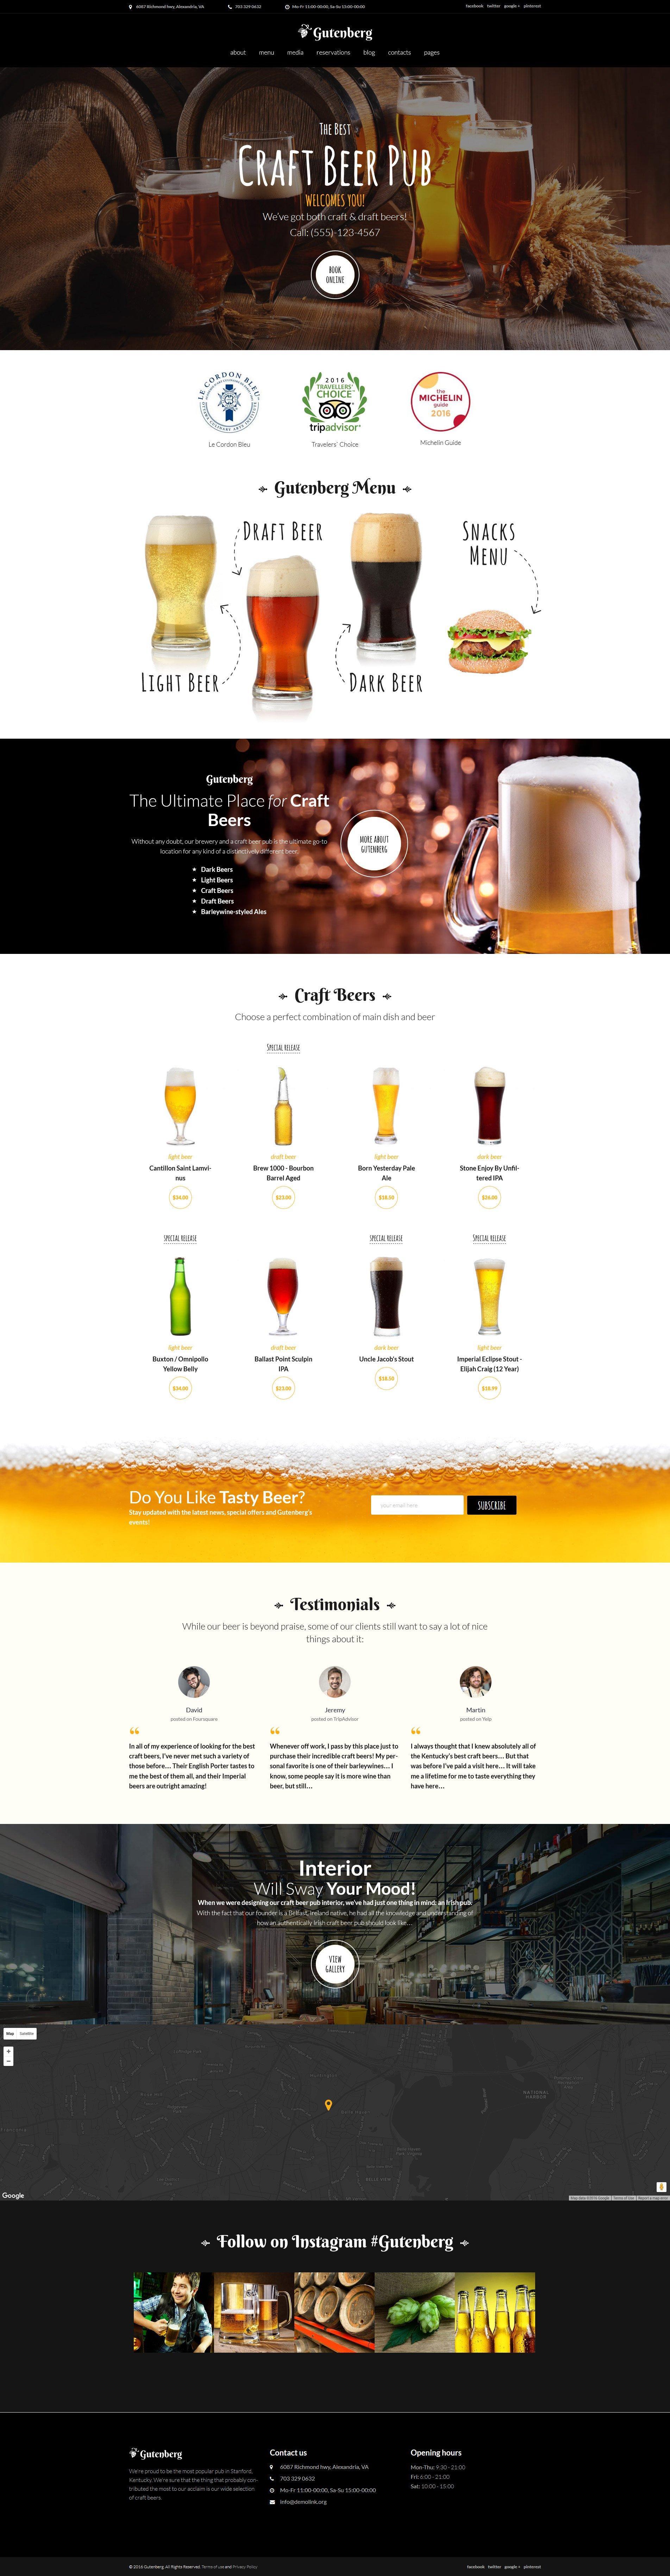 Motyw WordPress GutenBerg - Beer Pub and Brewery #59005